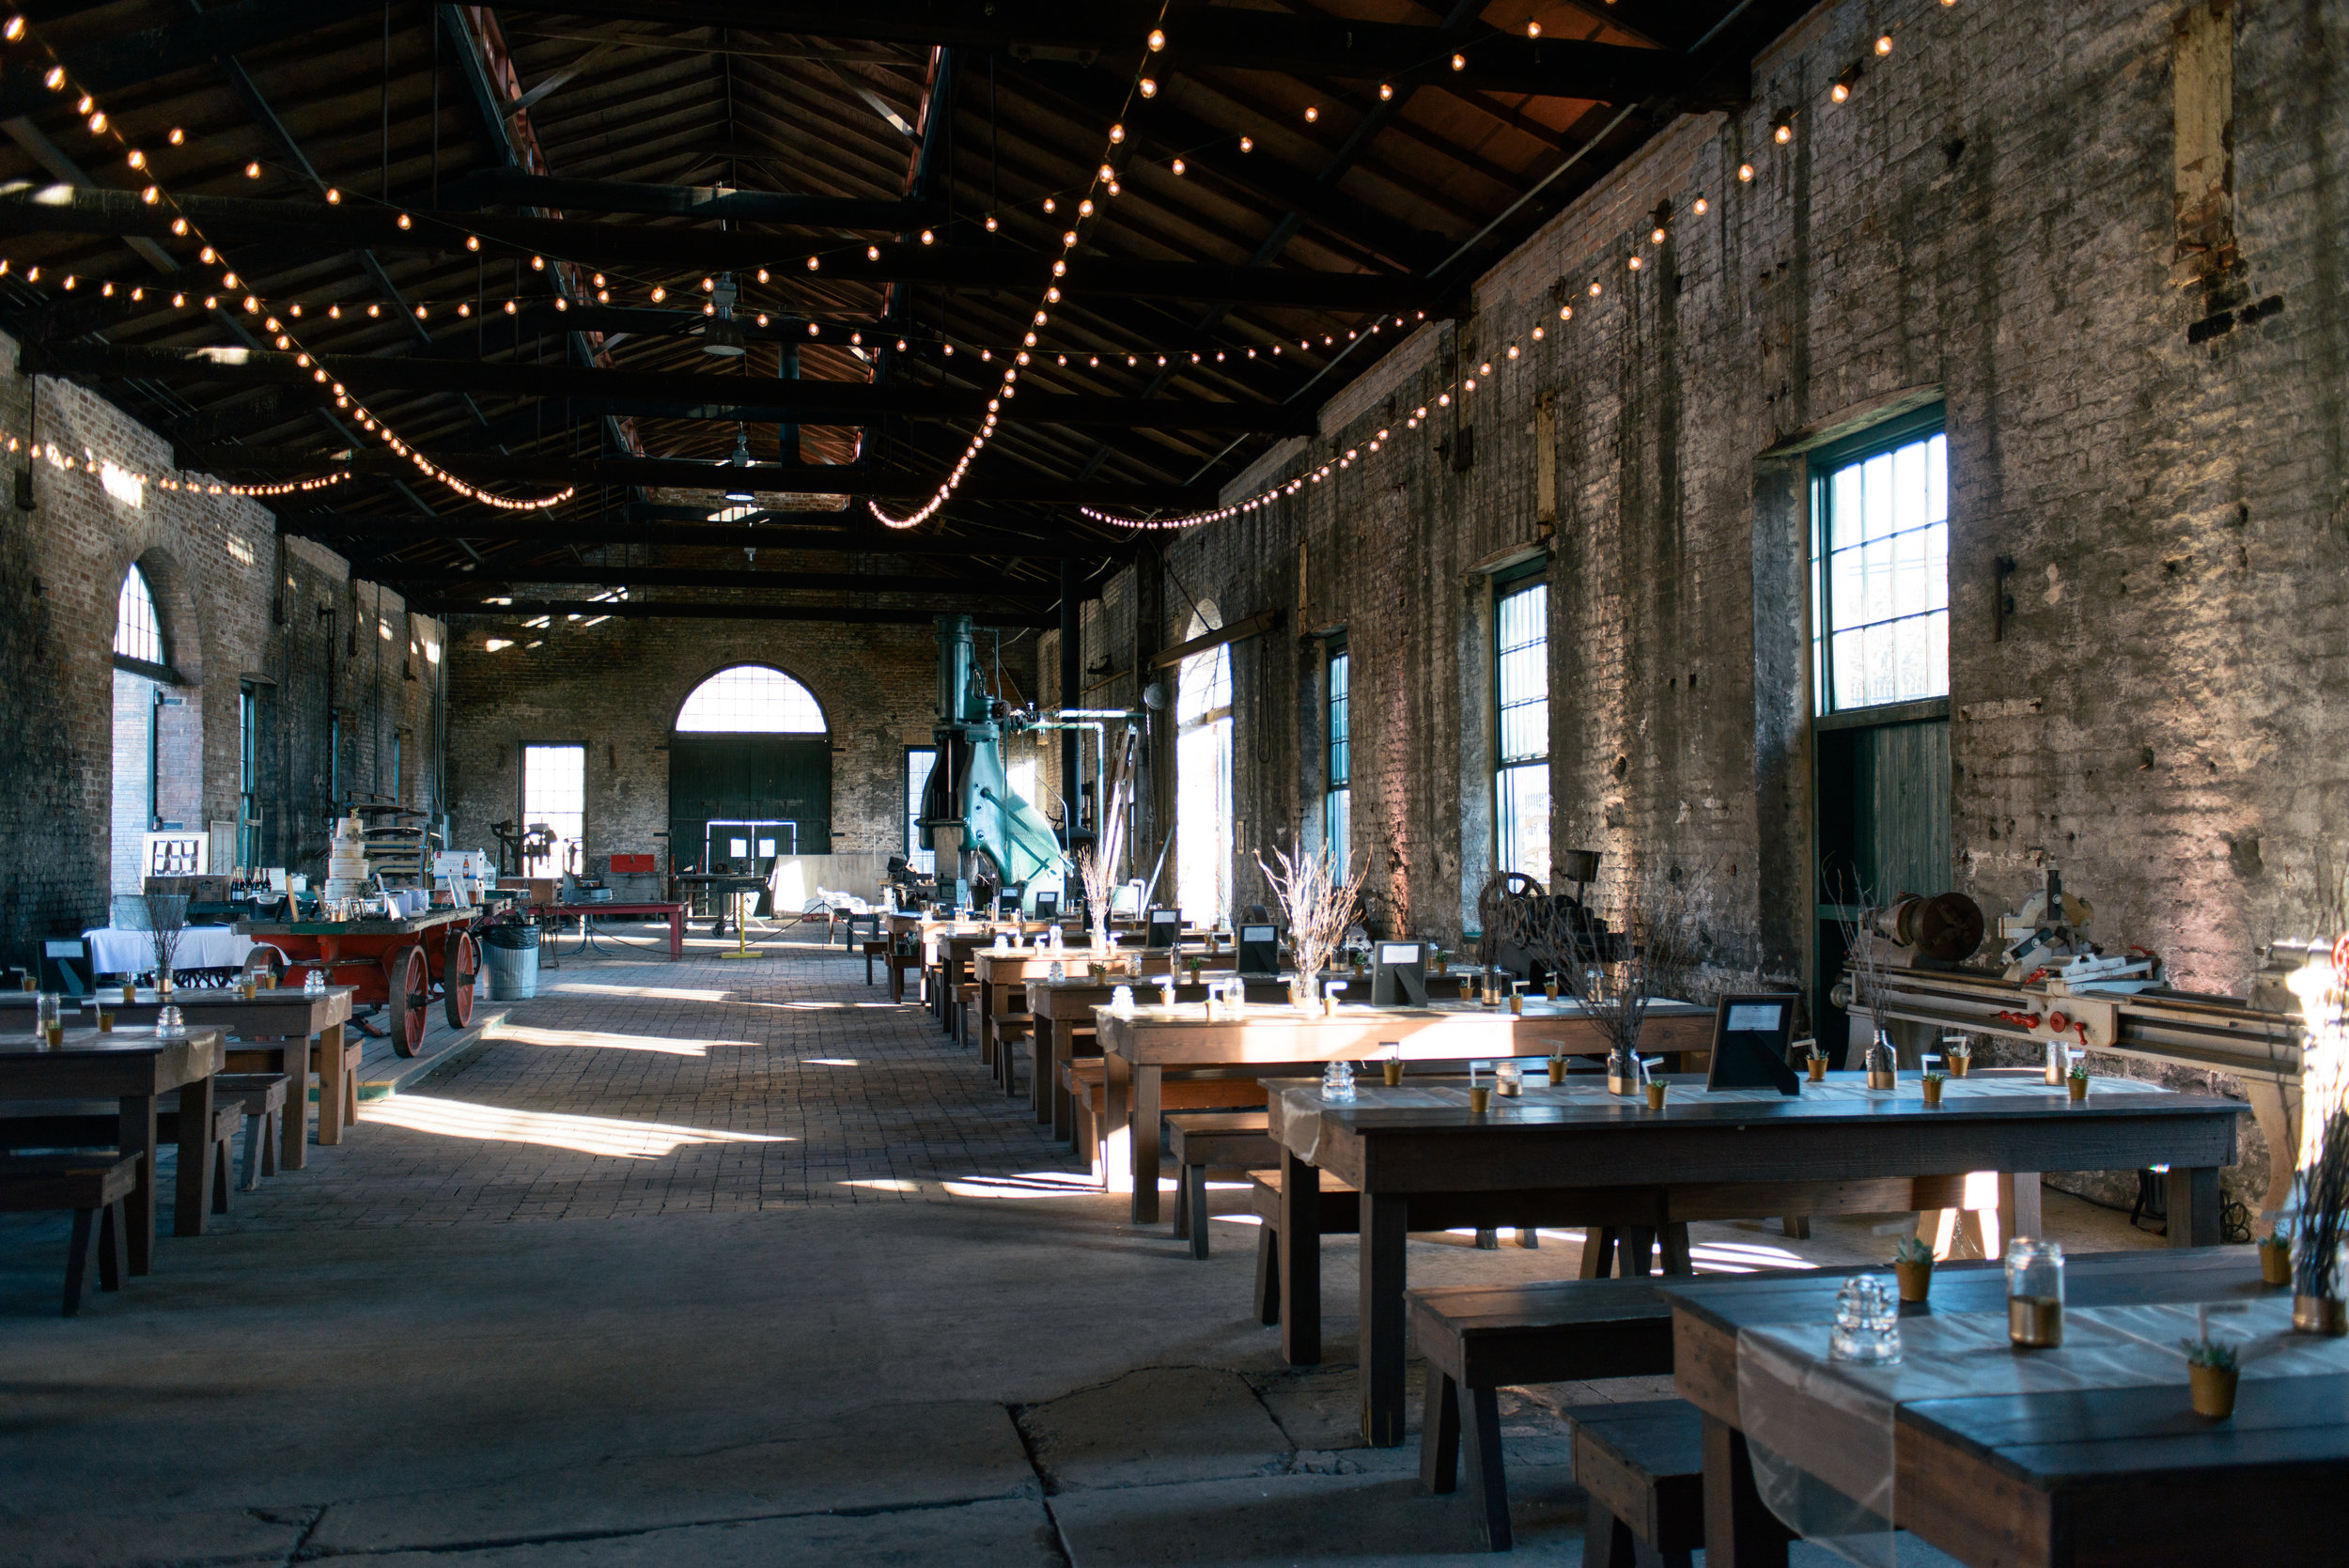 courtney-and-adam-railroad-museum-savannah-october-2016 (353 of 701).jpg